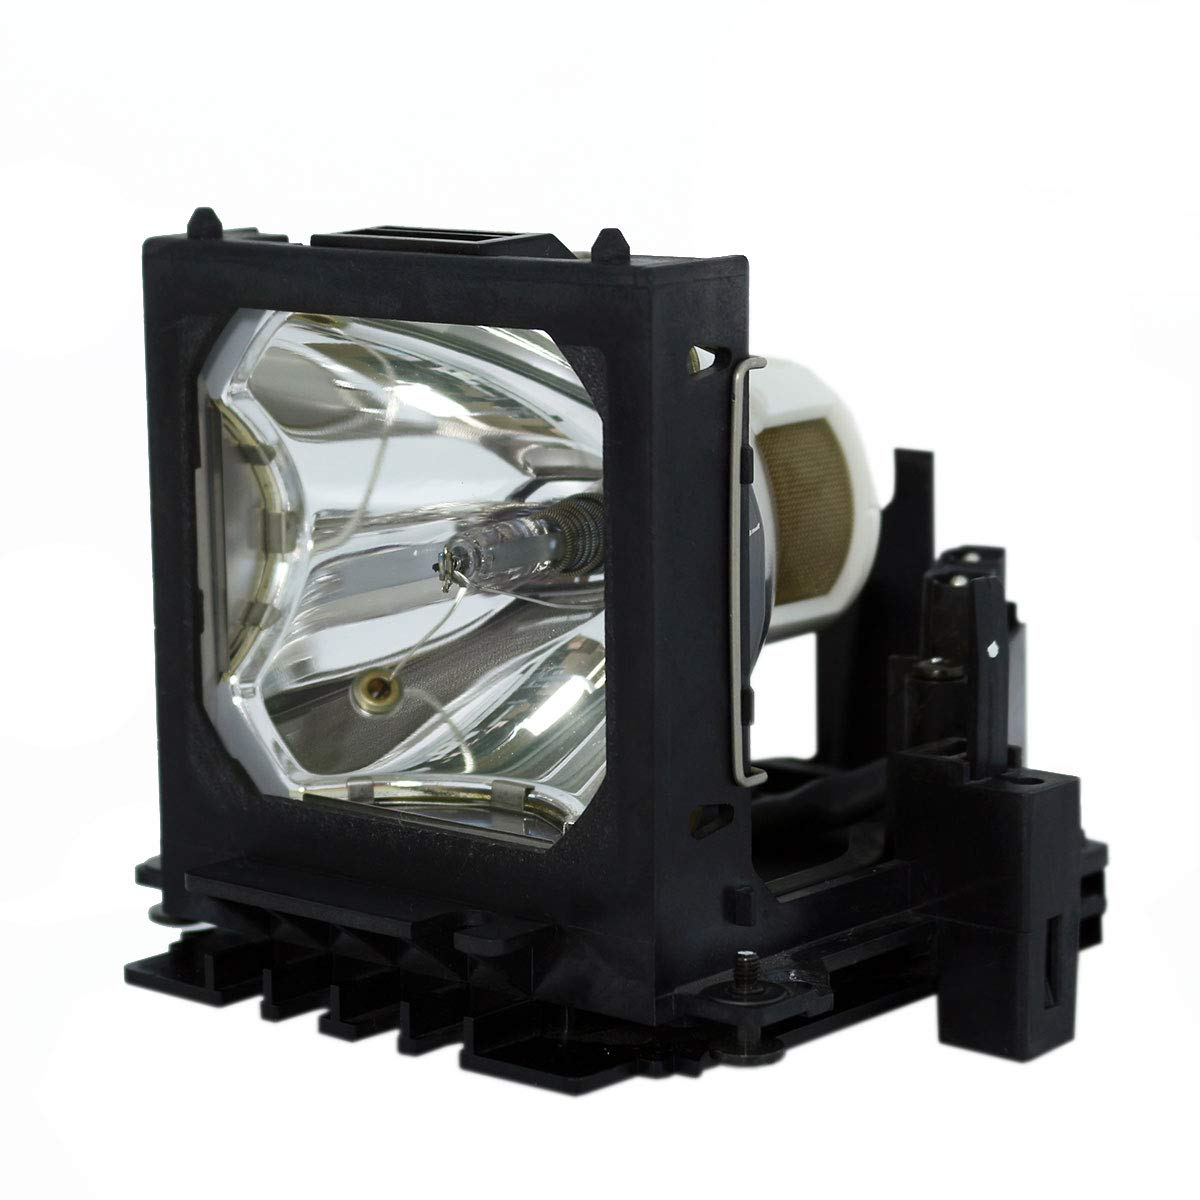 LYTIO プレミアム ViewSonic RLC-005 プロジェクターランプ ハウジング付き PRJ RLC 005 (オリジナルOEM電球内蔵)   B07JJFGWPB